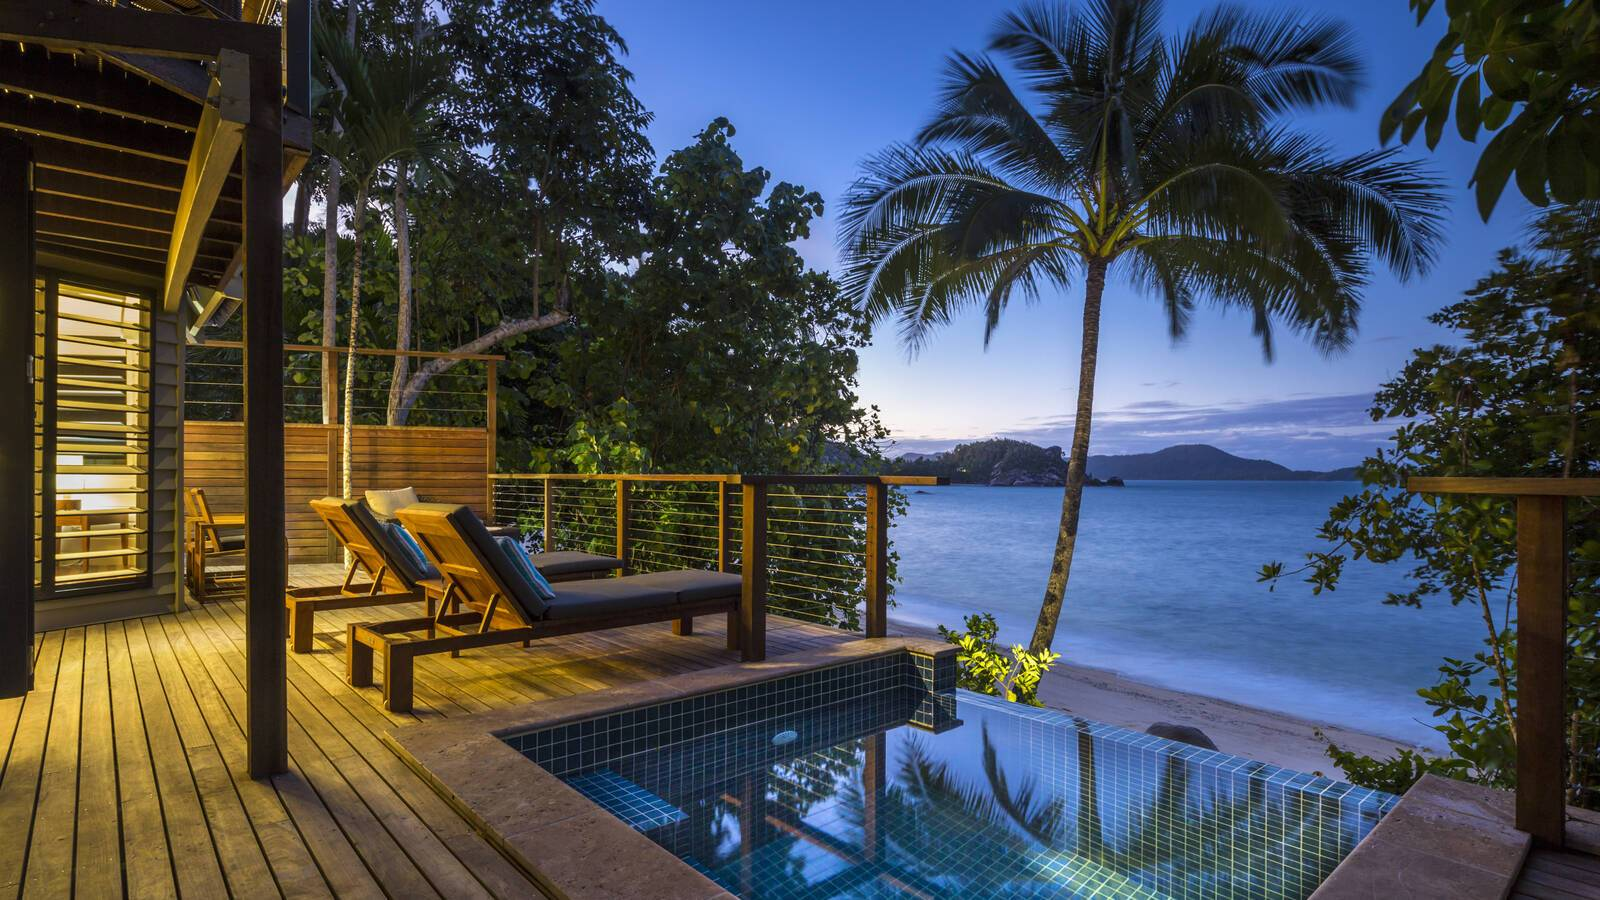 Bedarra Island Beach House Piscine Australie